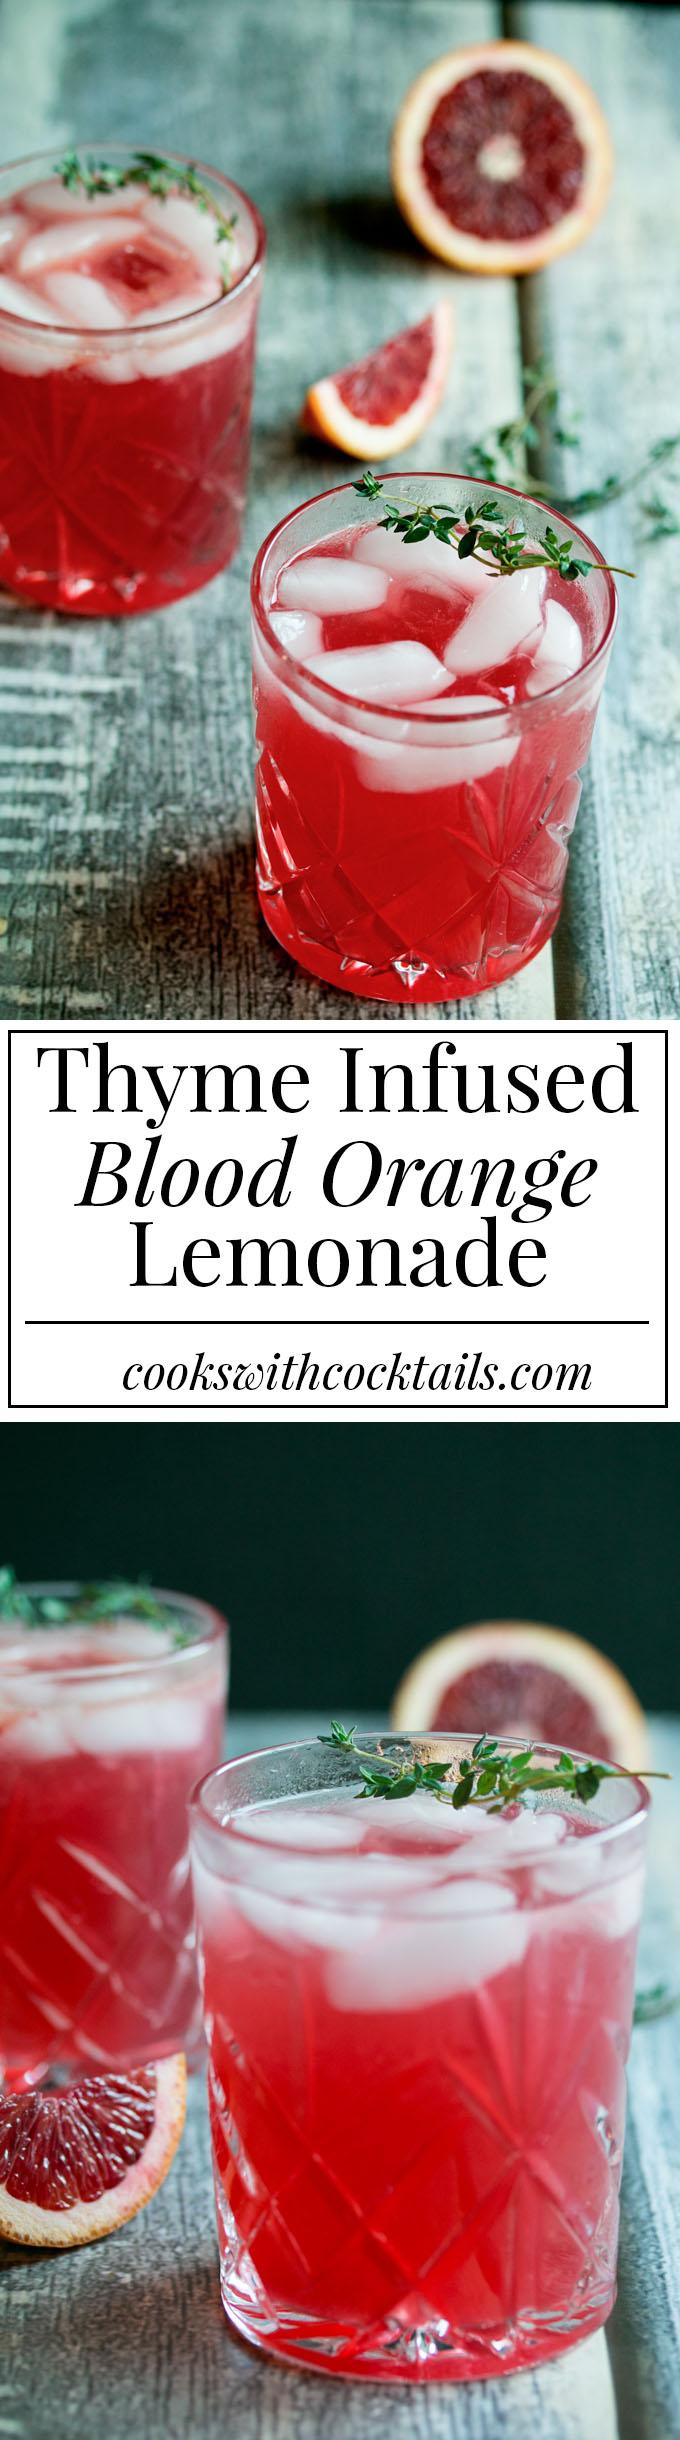 Hard Thyme Infused Blood Orange Lemonade